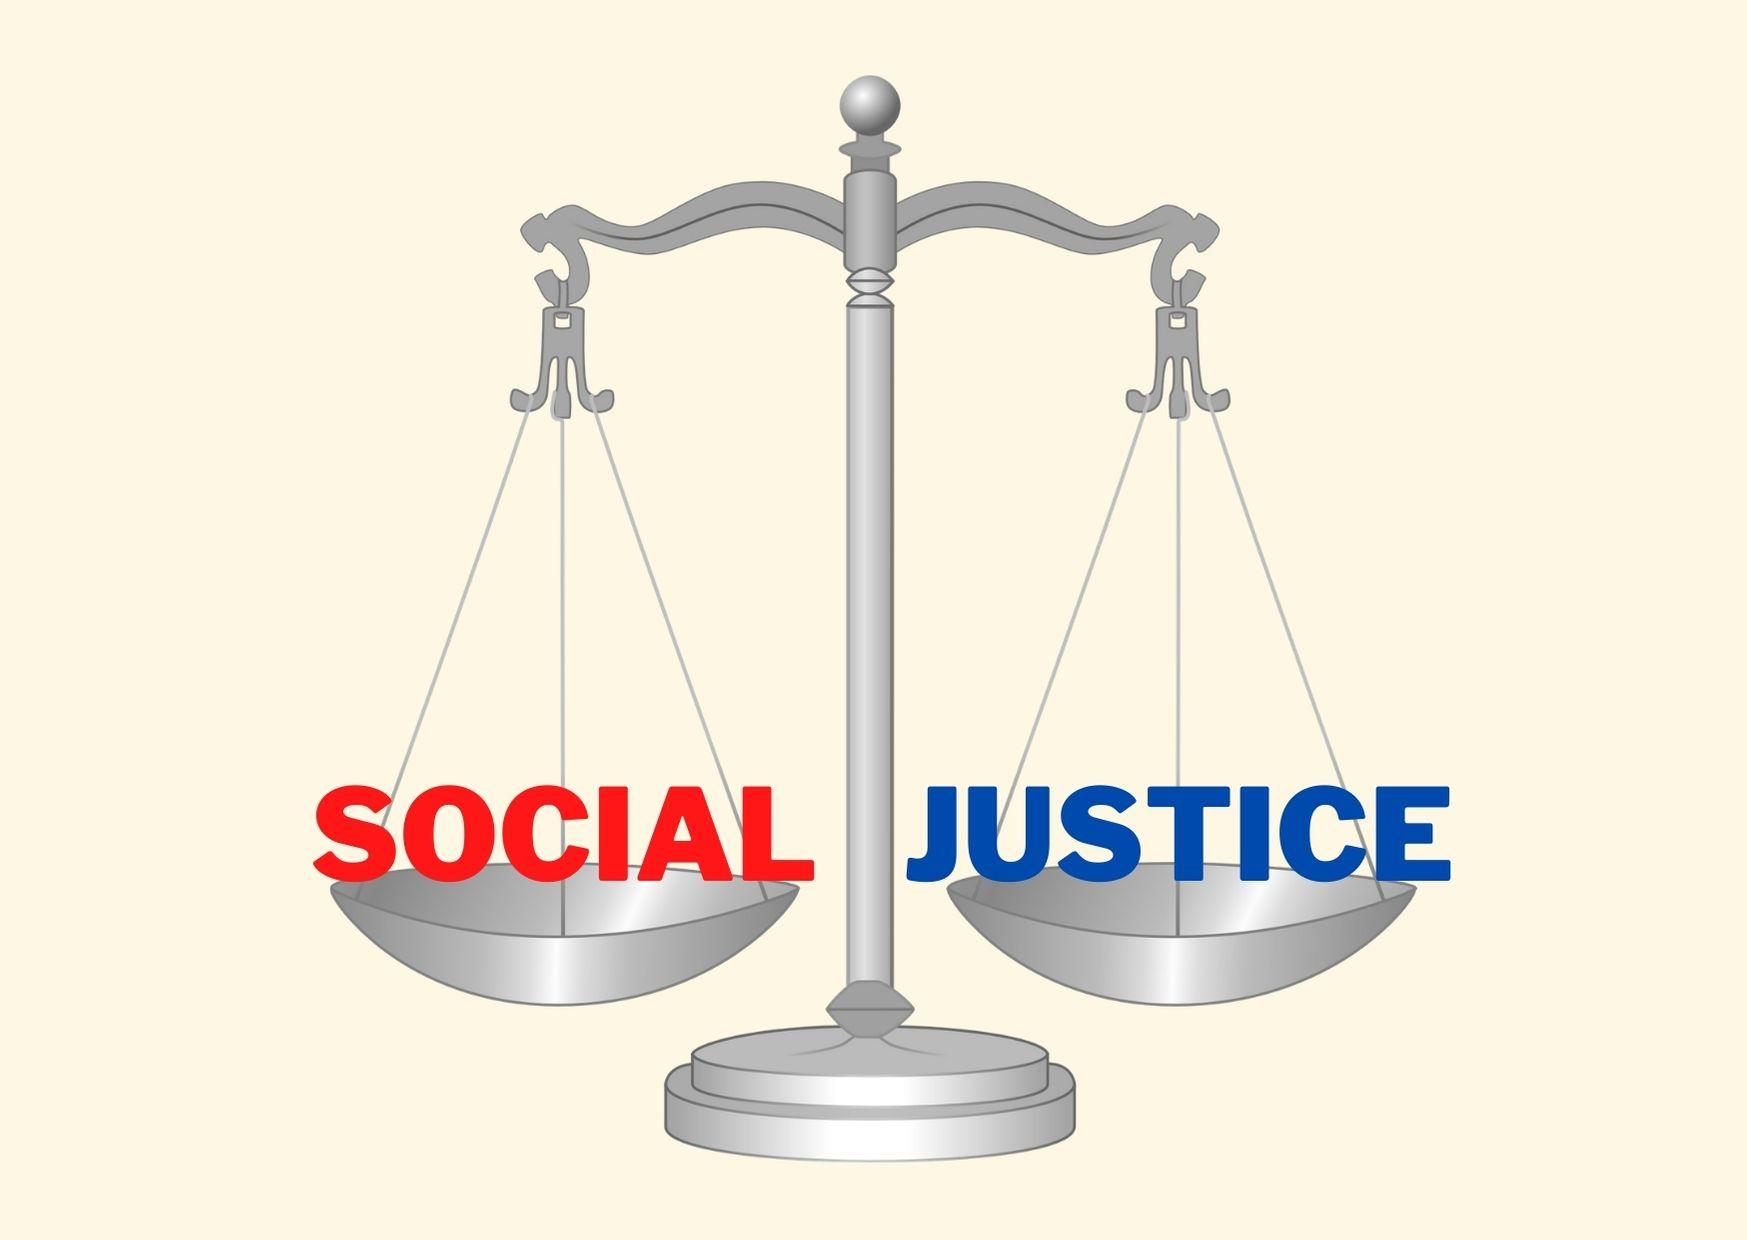 12 g3 en world day of social justice-2